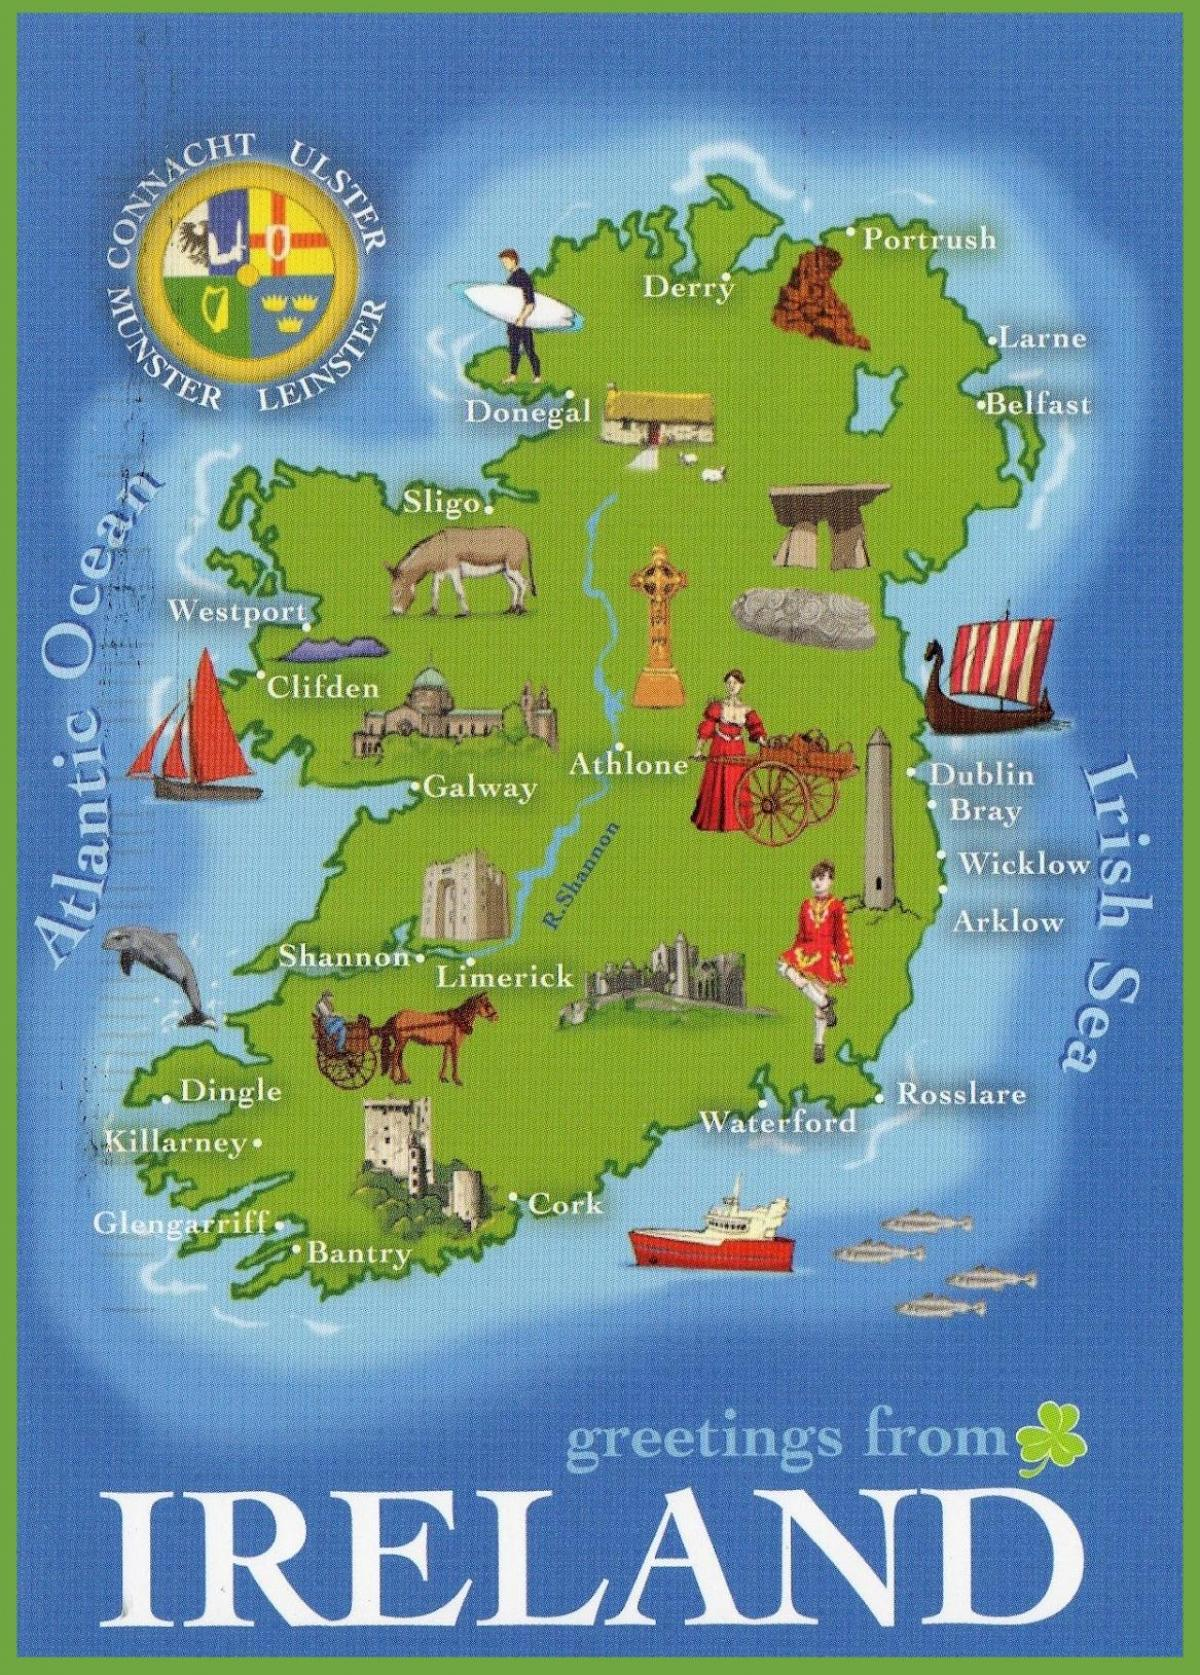 Irlanda Cartina Turistica.Cartina Mappa Turistica Dell Irlanda Mappa Di Irlanda Principali Attrazioni Europa Del Nord Europa